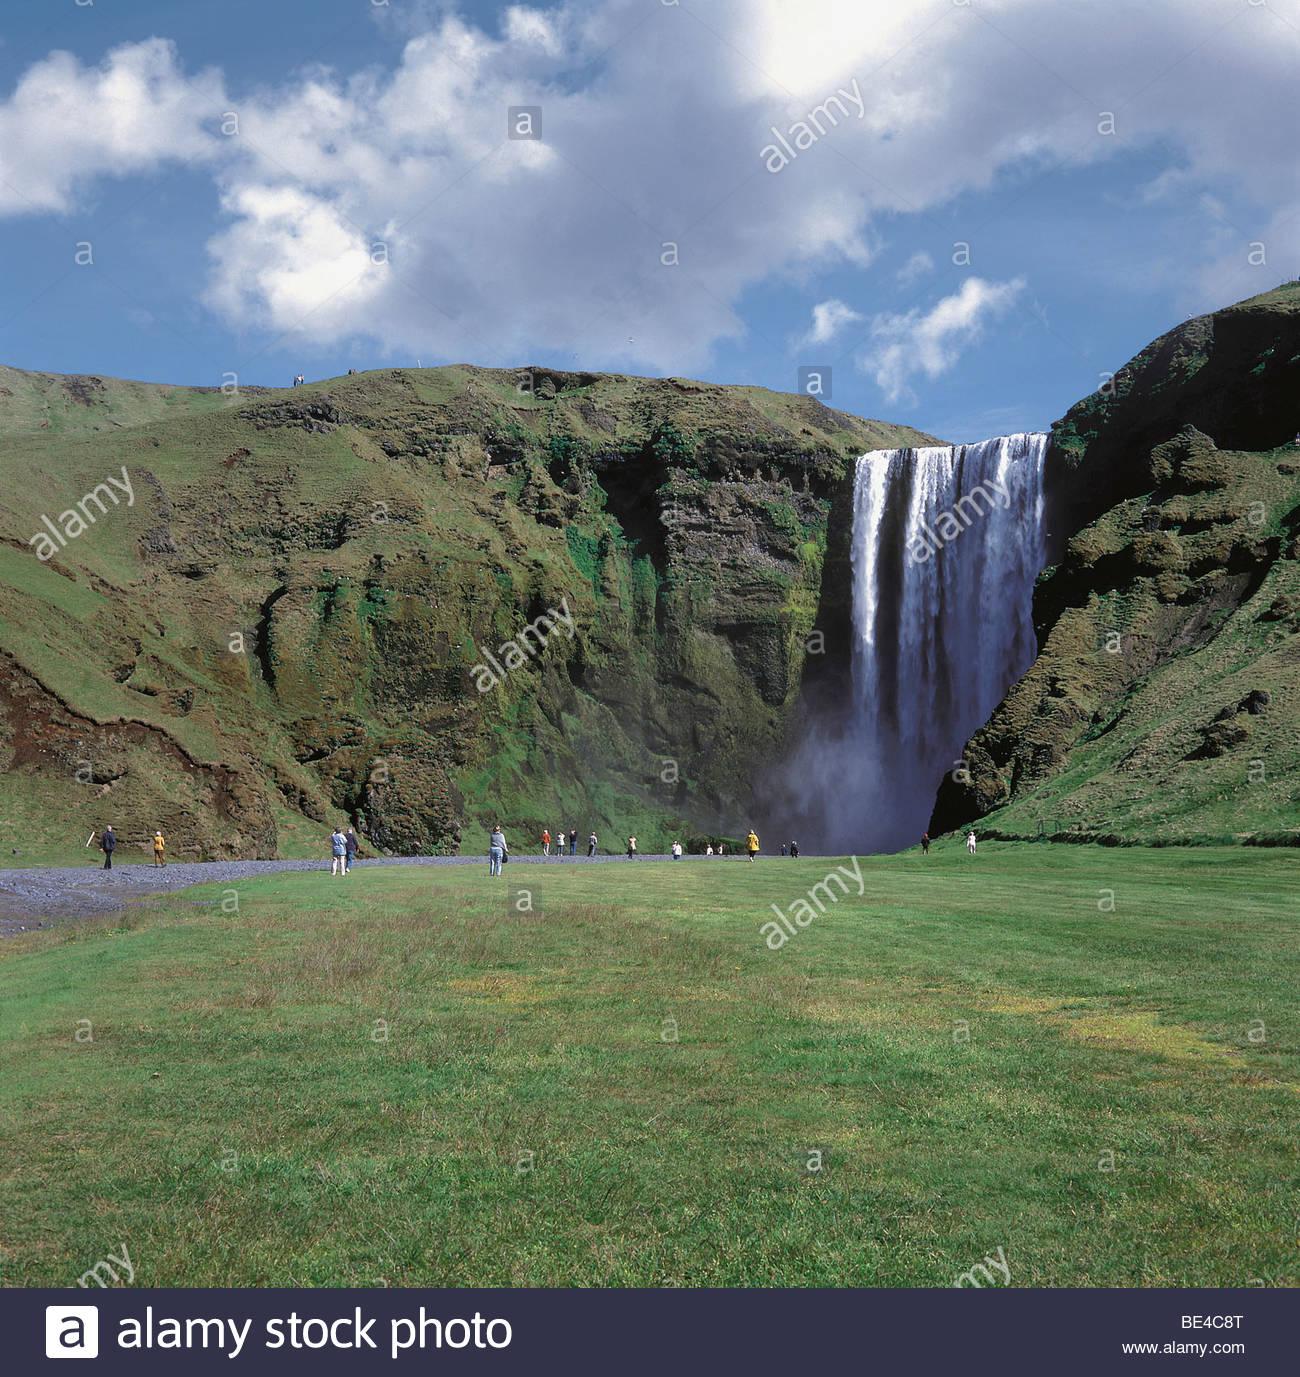 Tourists looking at a waterfall, Skogafoss, Rangarvallasysla, Iceland Stock Photo